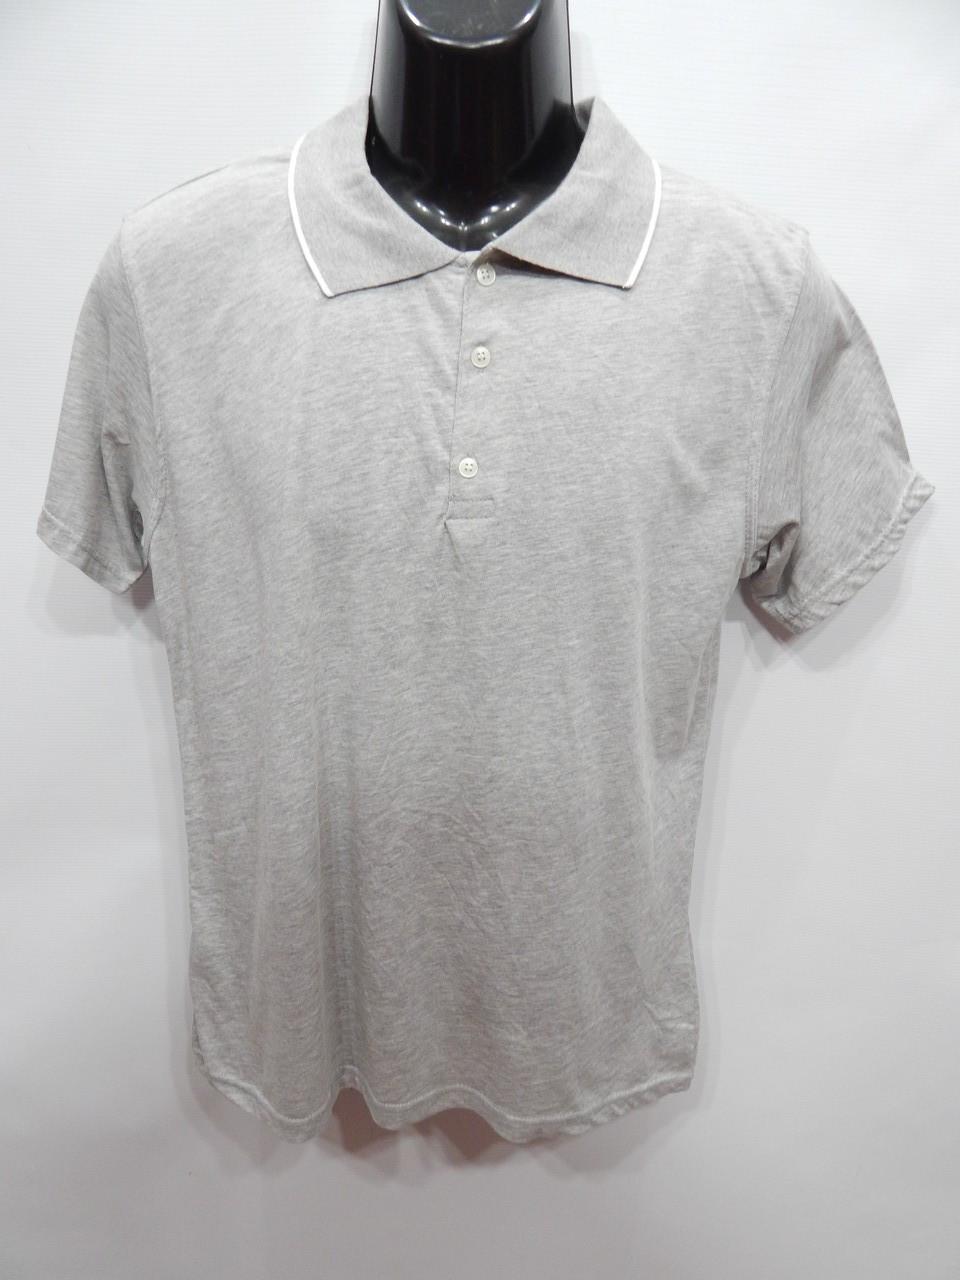 Чоловіча футболка поло Topax collection р. 48 005мф